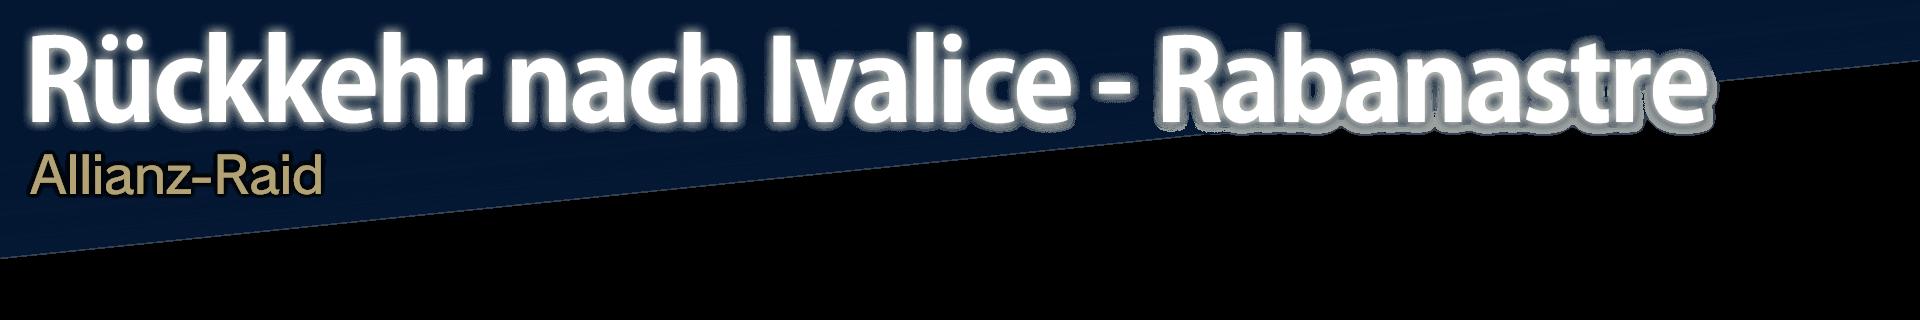 Rückkehr nach Ivalice - Rabanastre Allianz-Raid